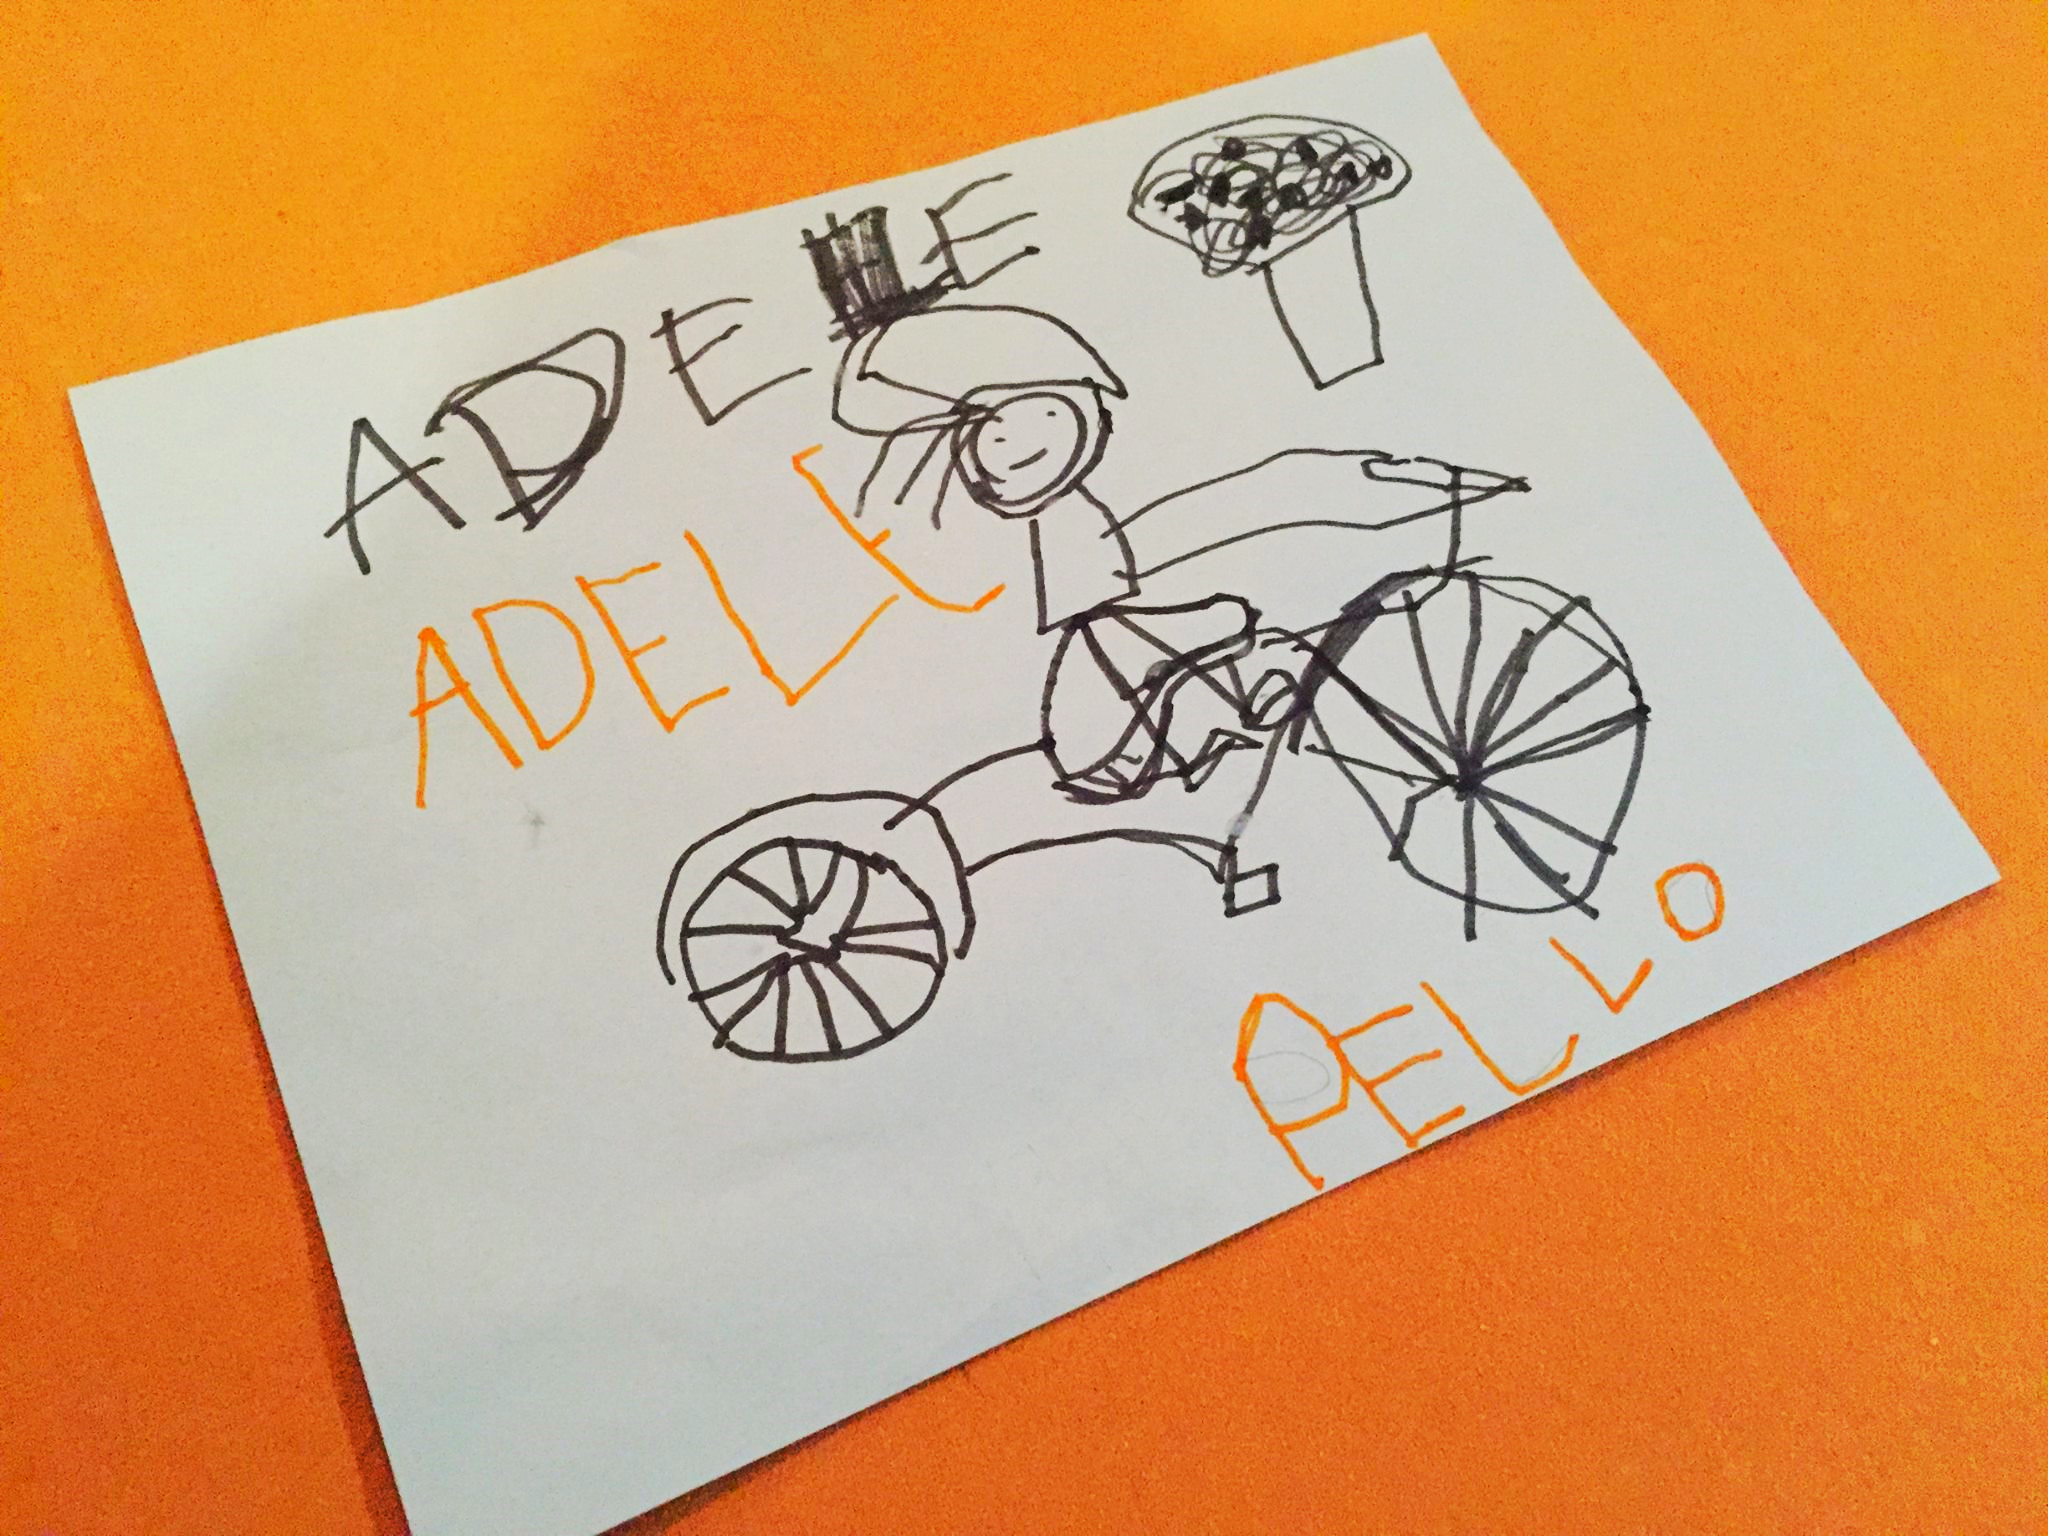 Pello Bikes first fan art. Thank you!